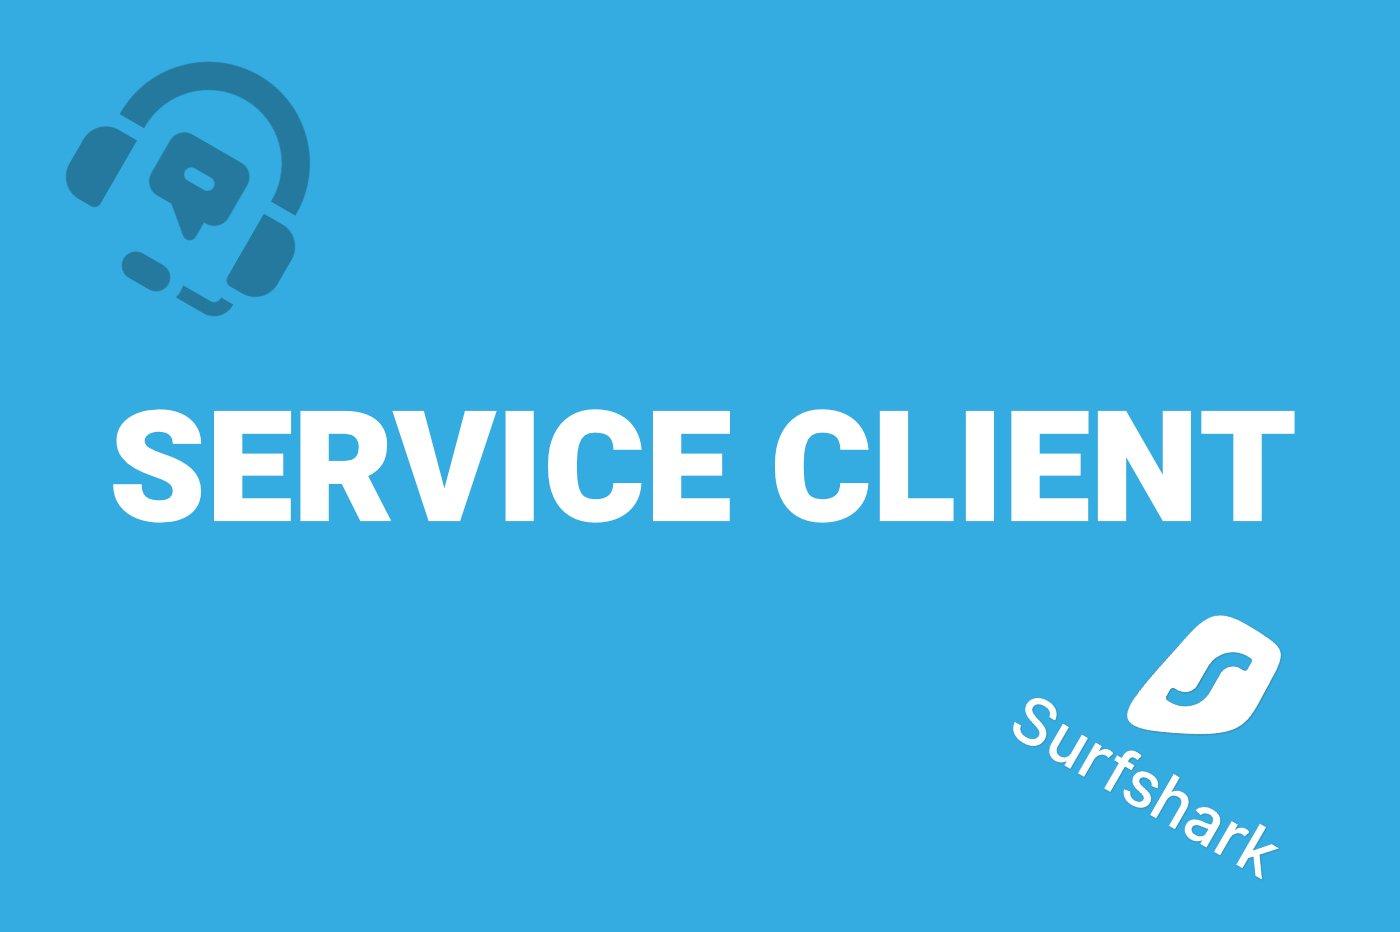 Service client Surfshark